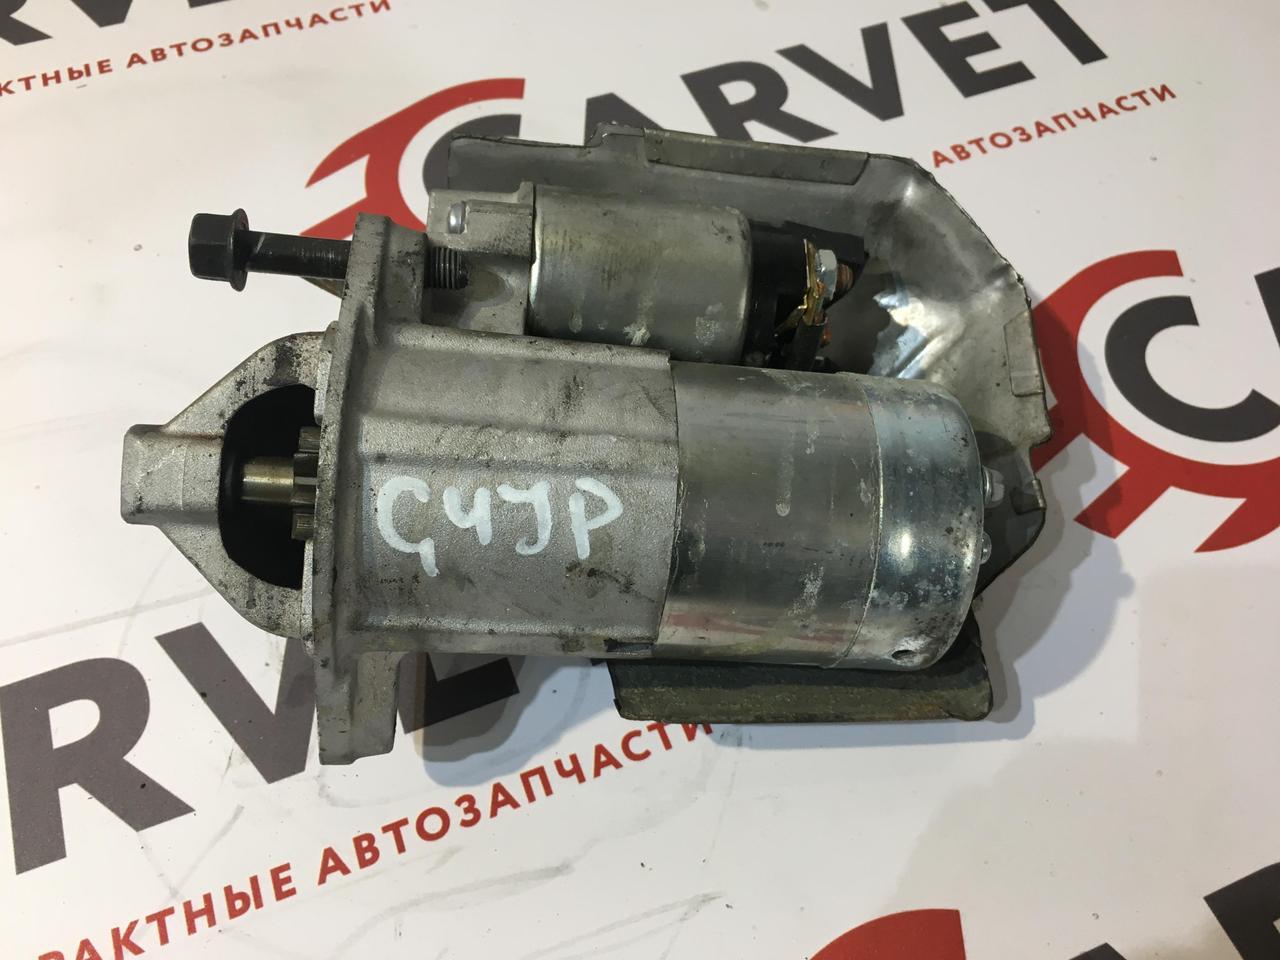 Стартер двигателя Hyundai Trajet. G4JP. , 2.0л., 131-137л.с.